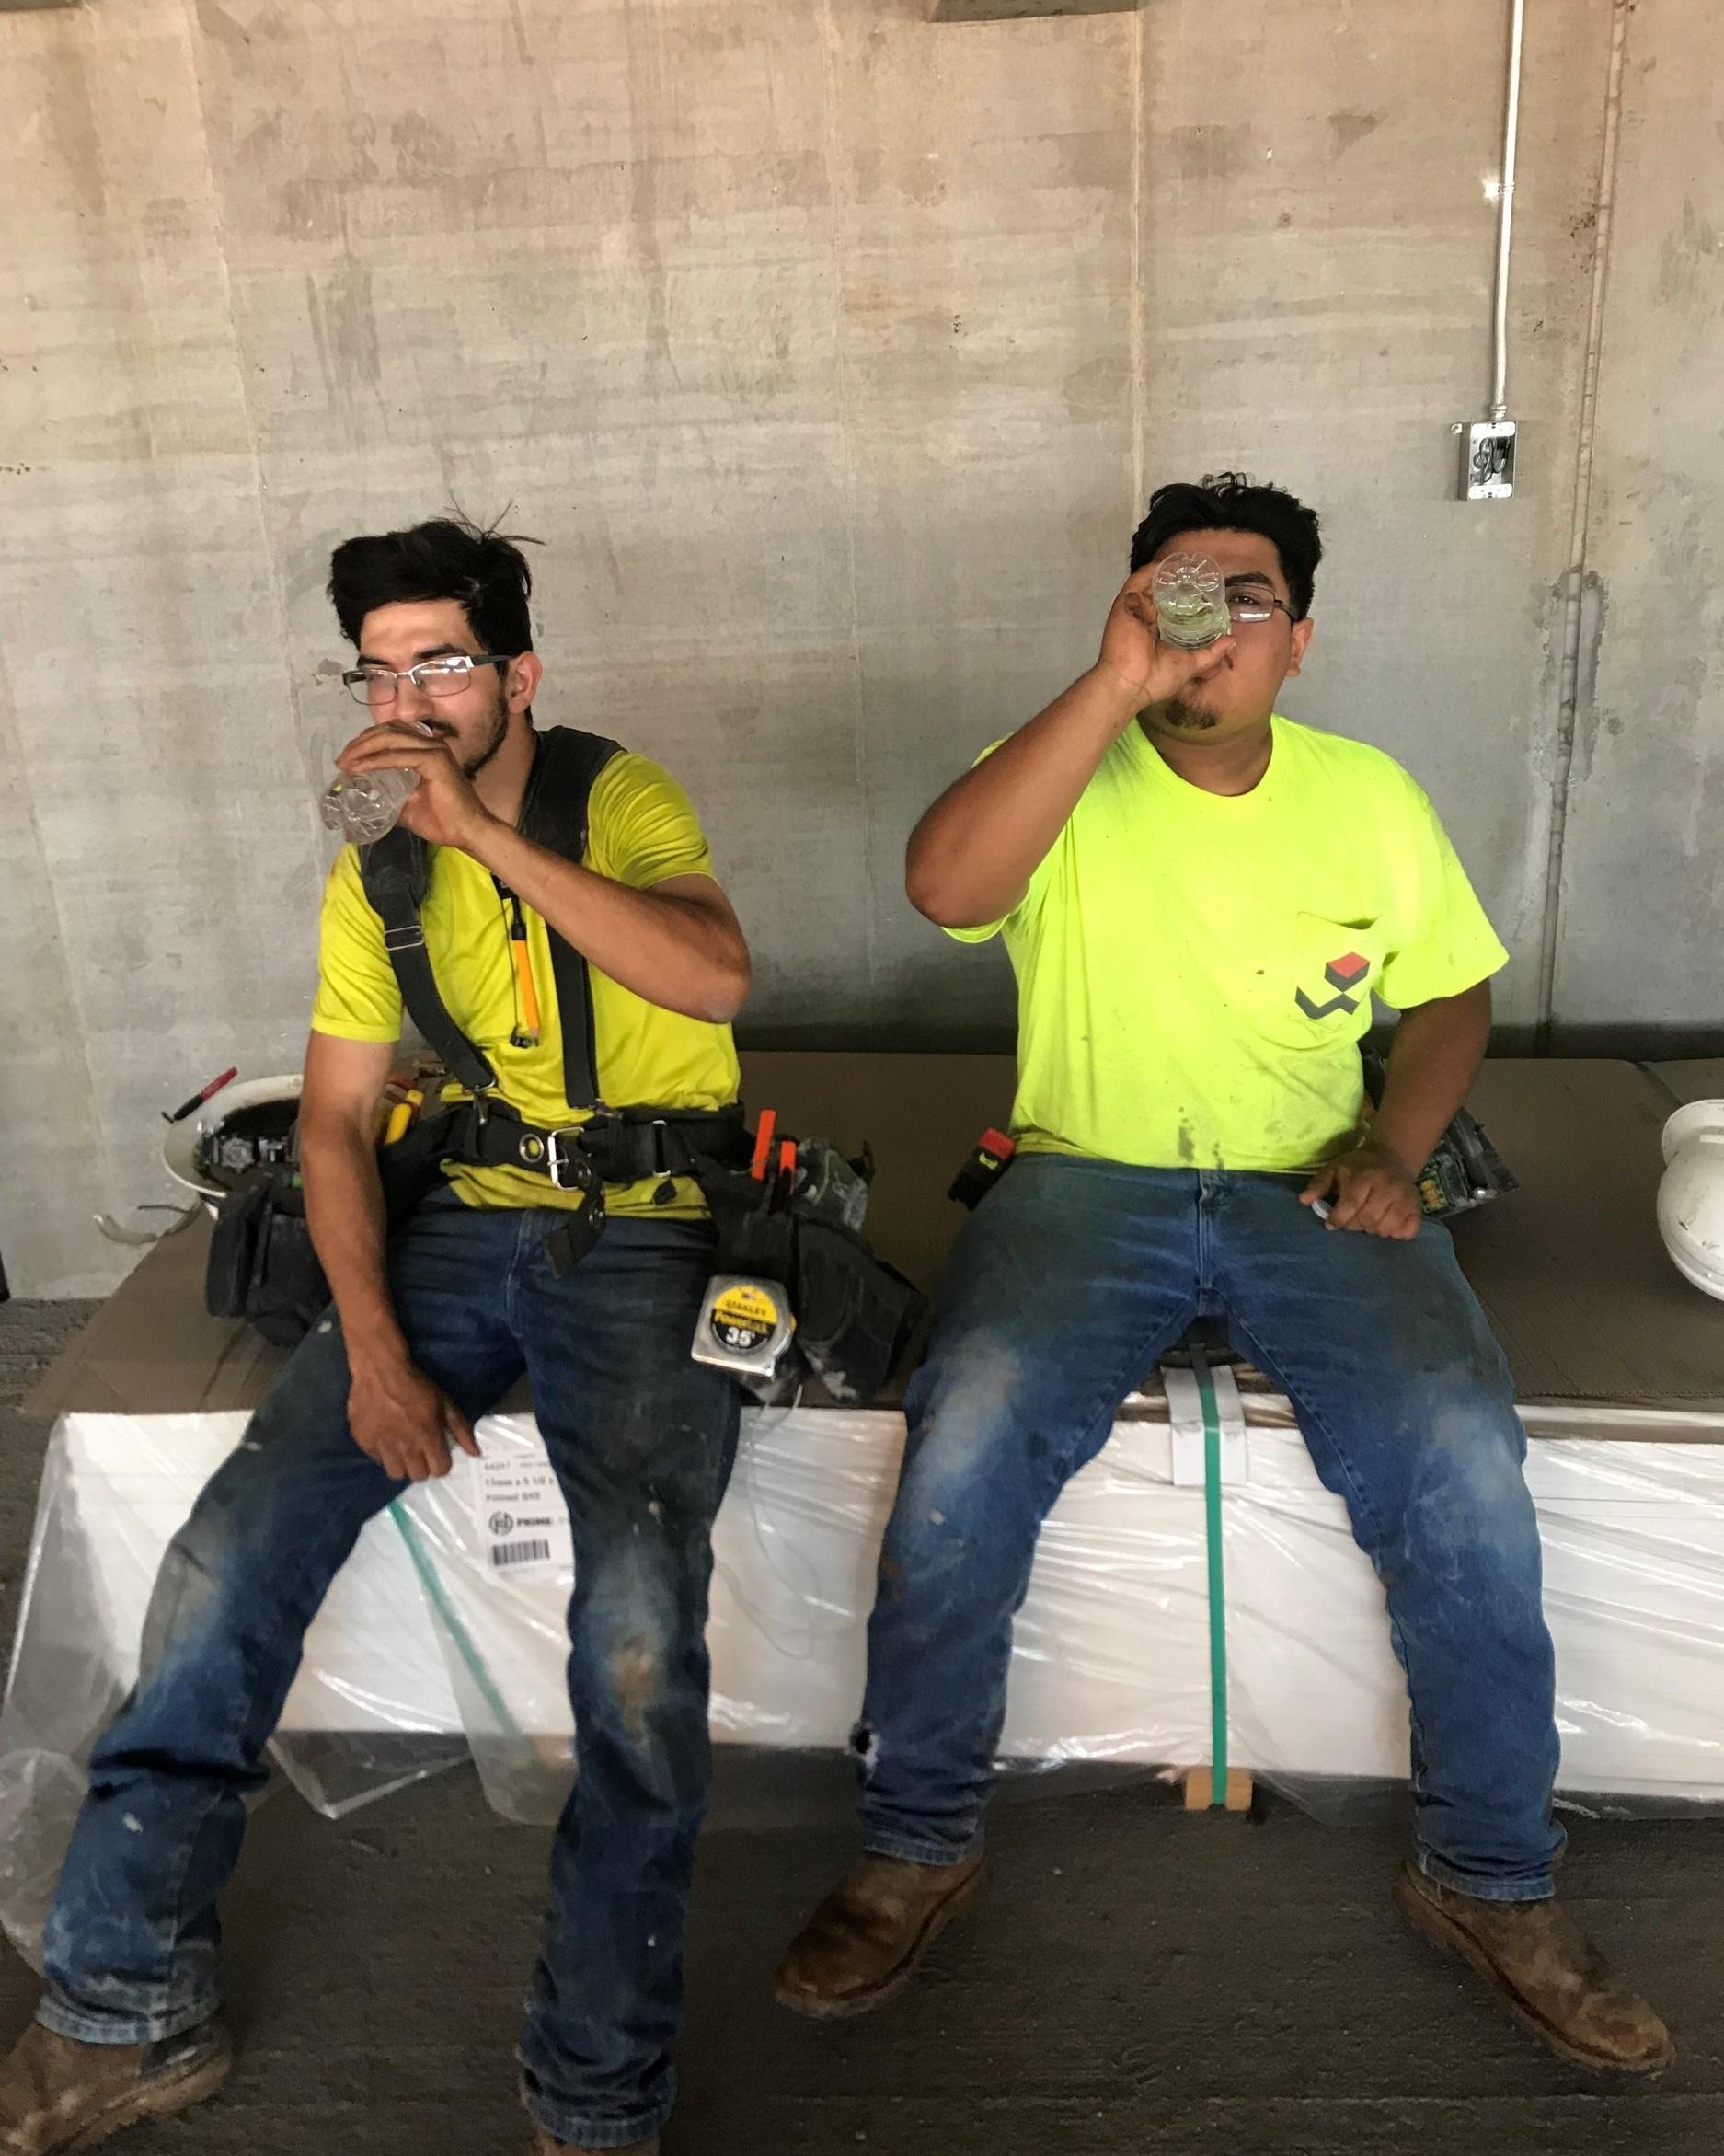 Employees-drinking-water.jpg